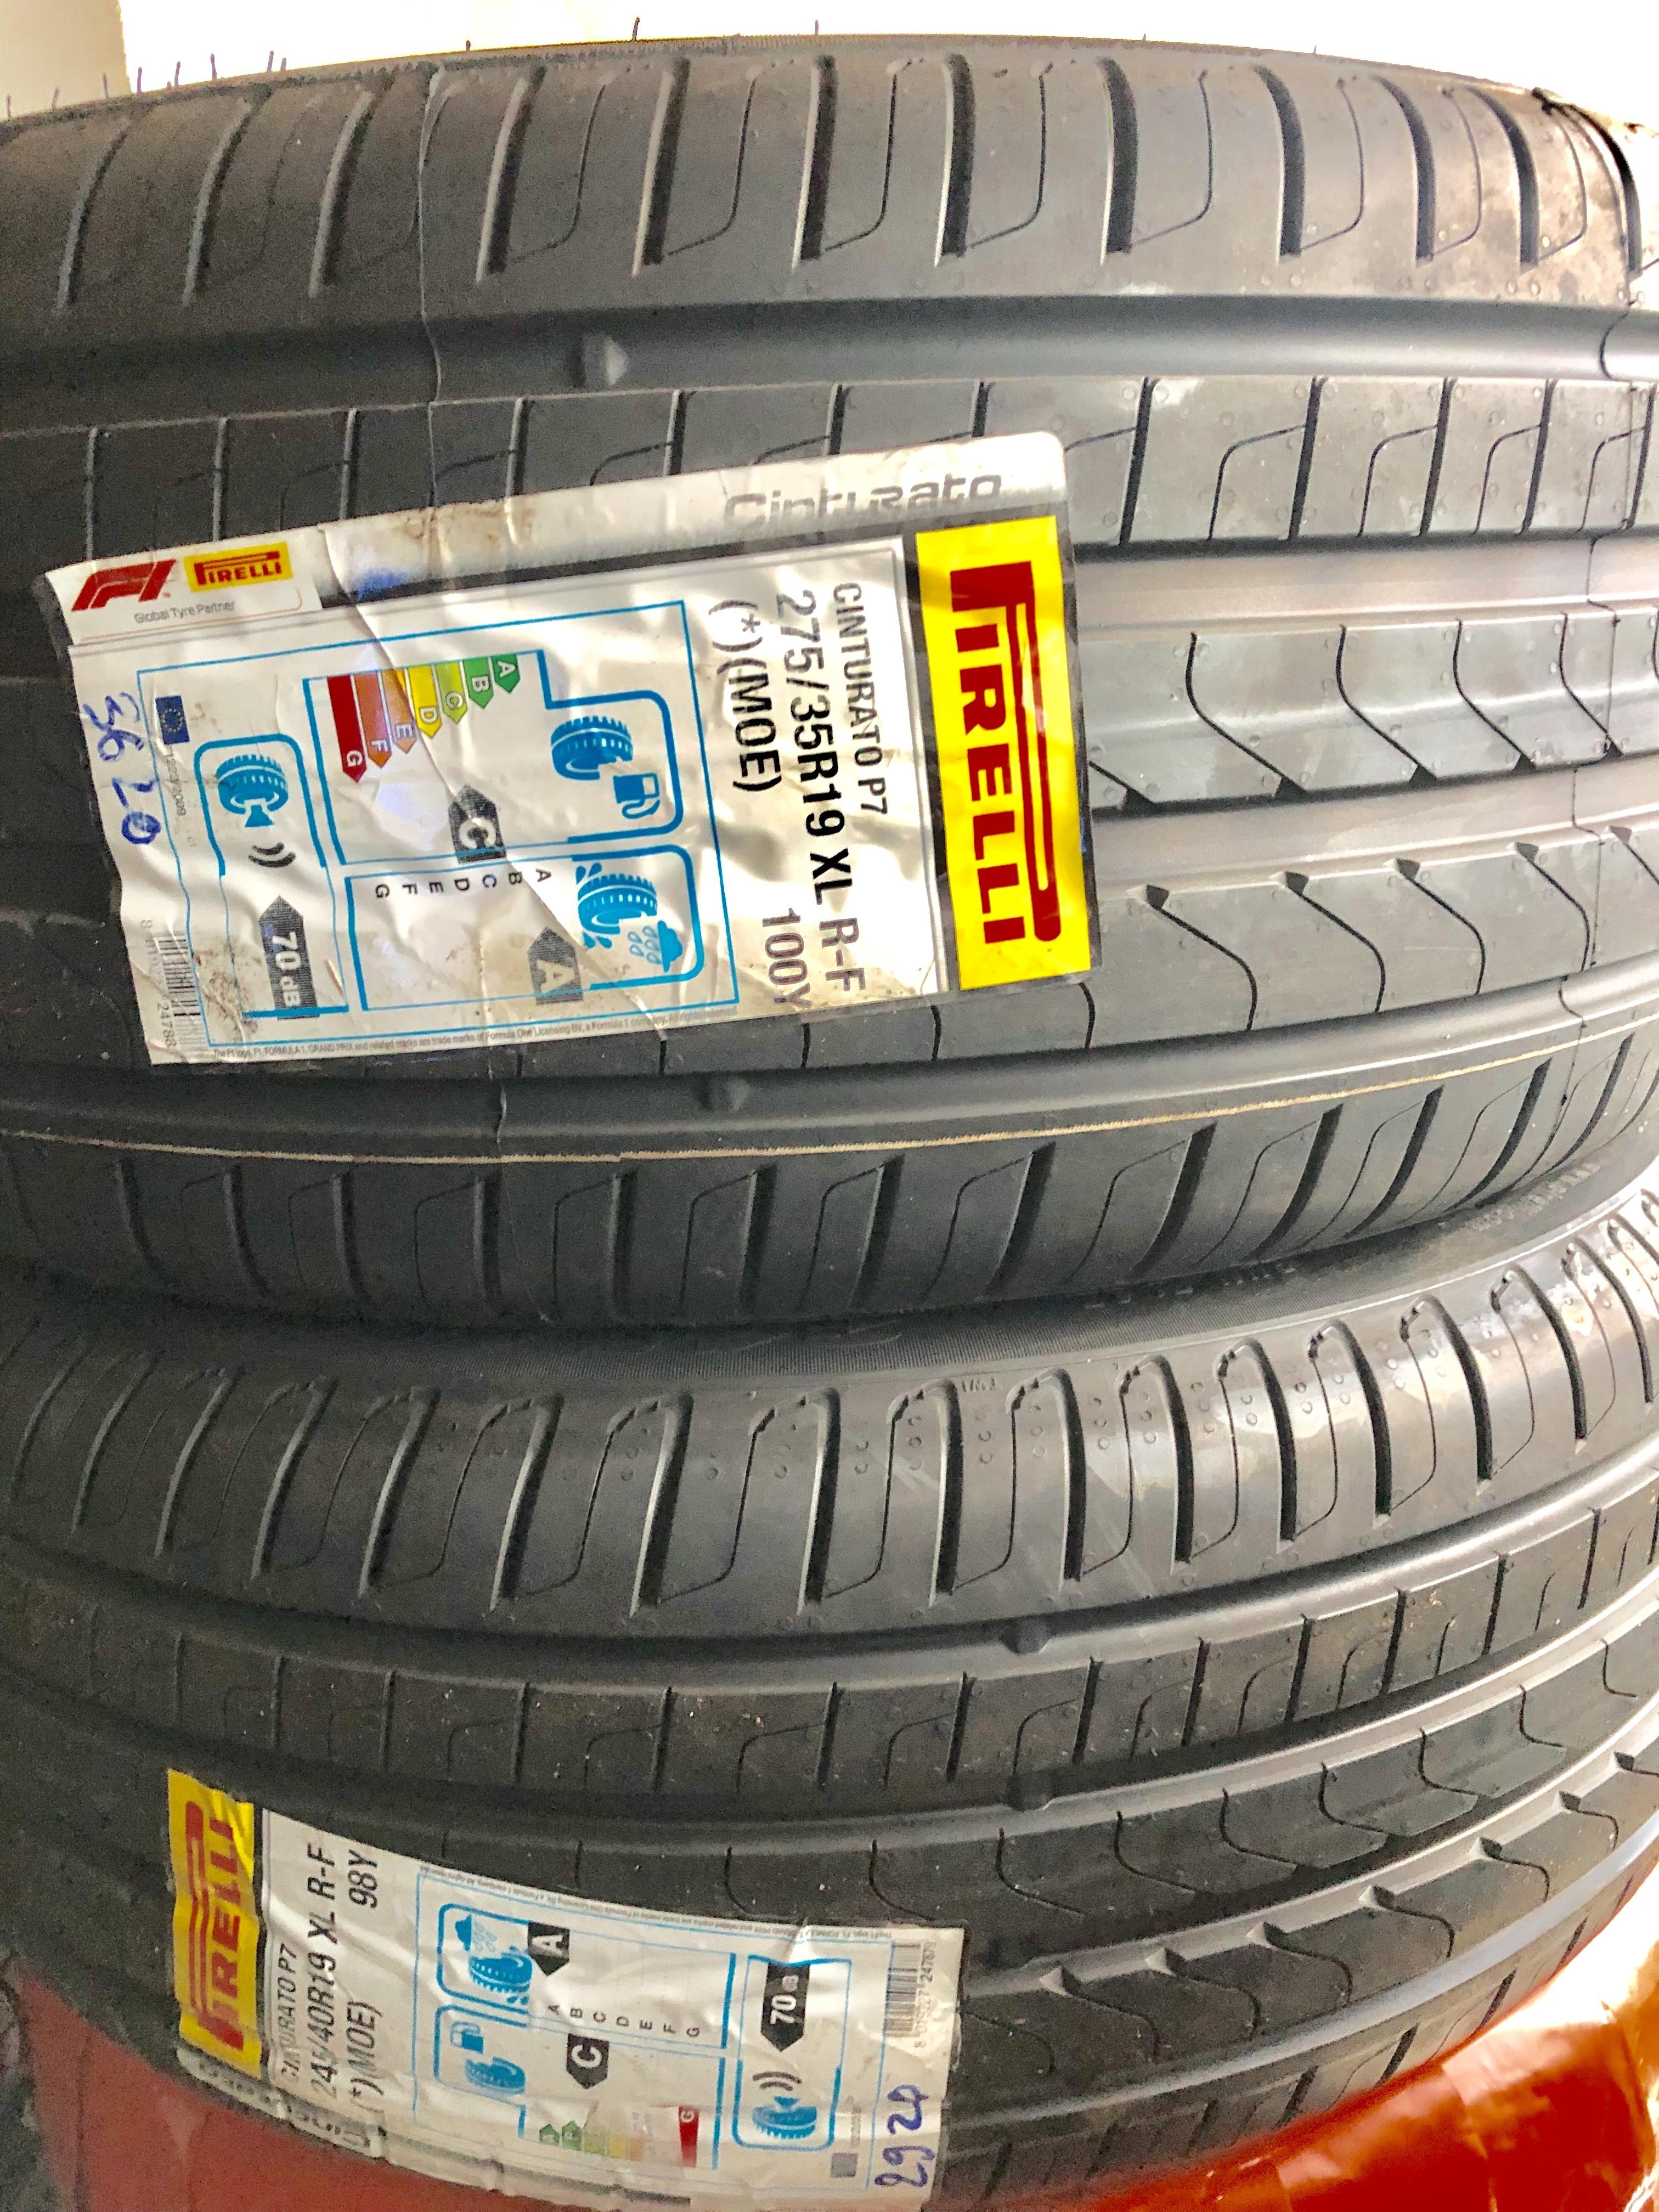 Lốp Pirelli 275/35/19 chống xịt ( Lốp xe Mer E)